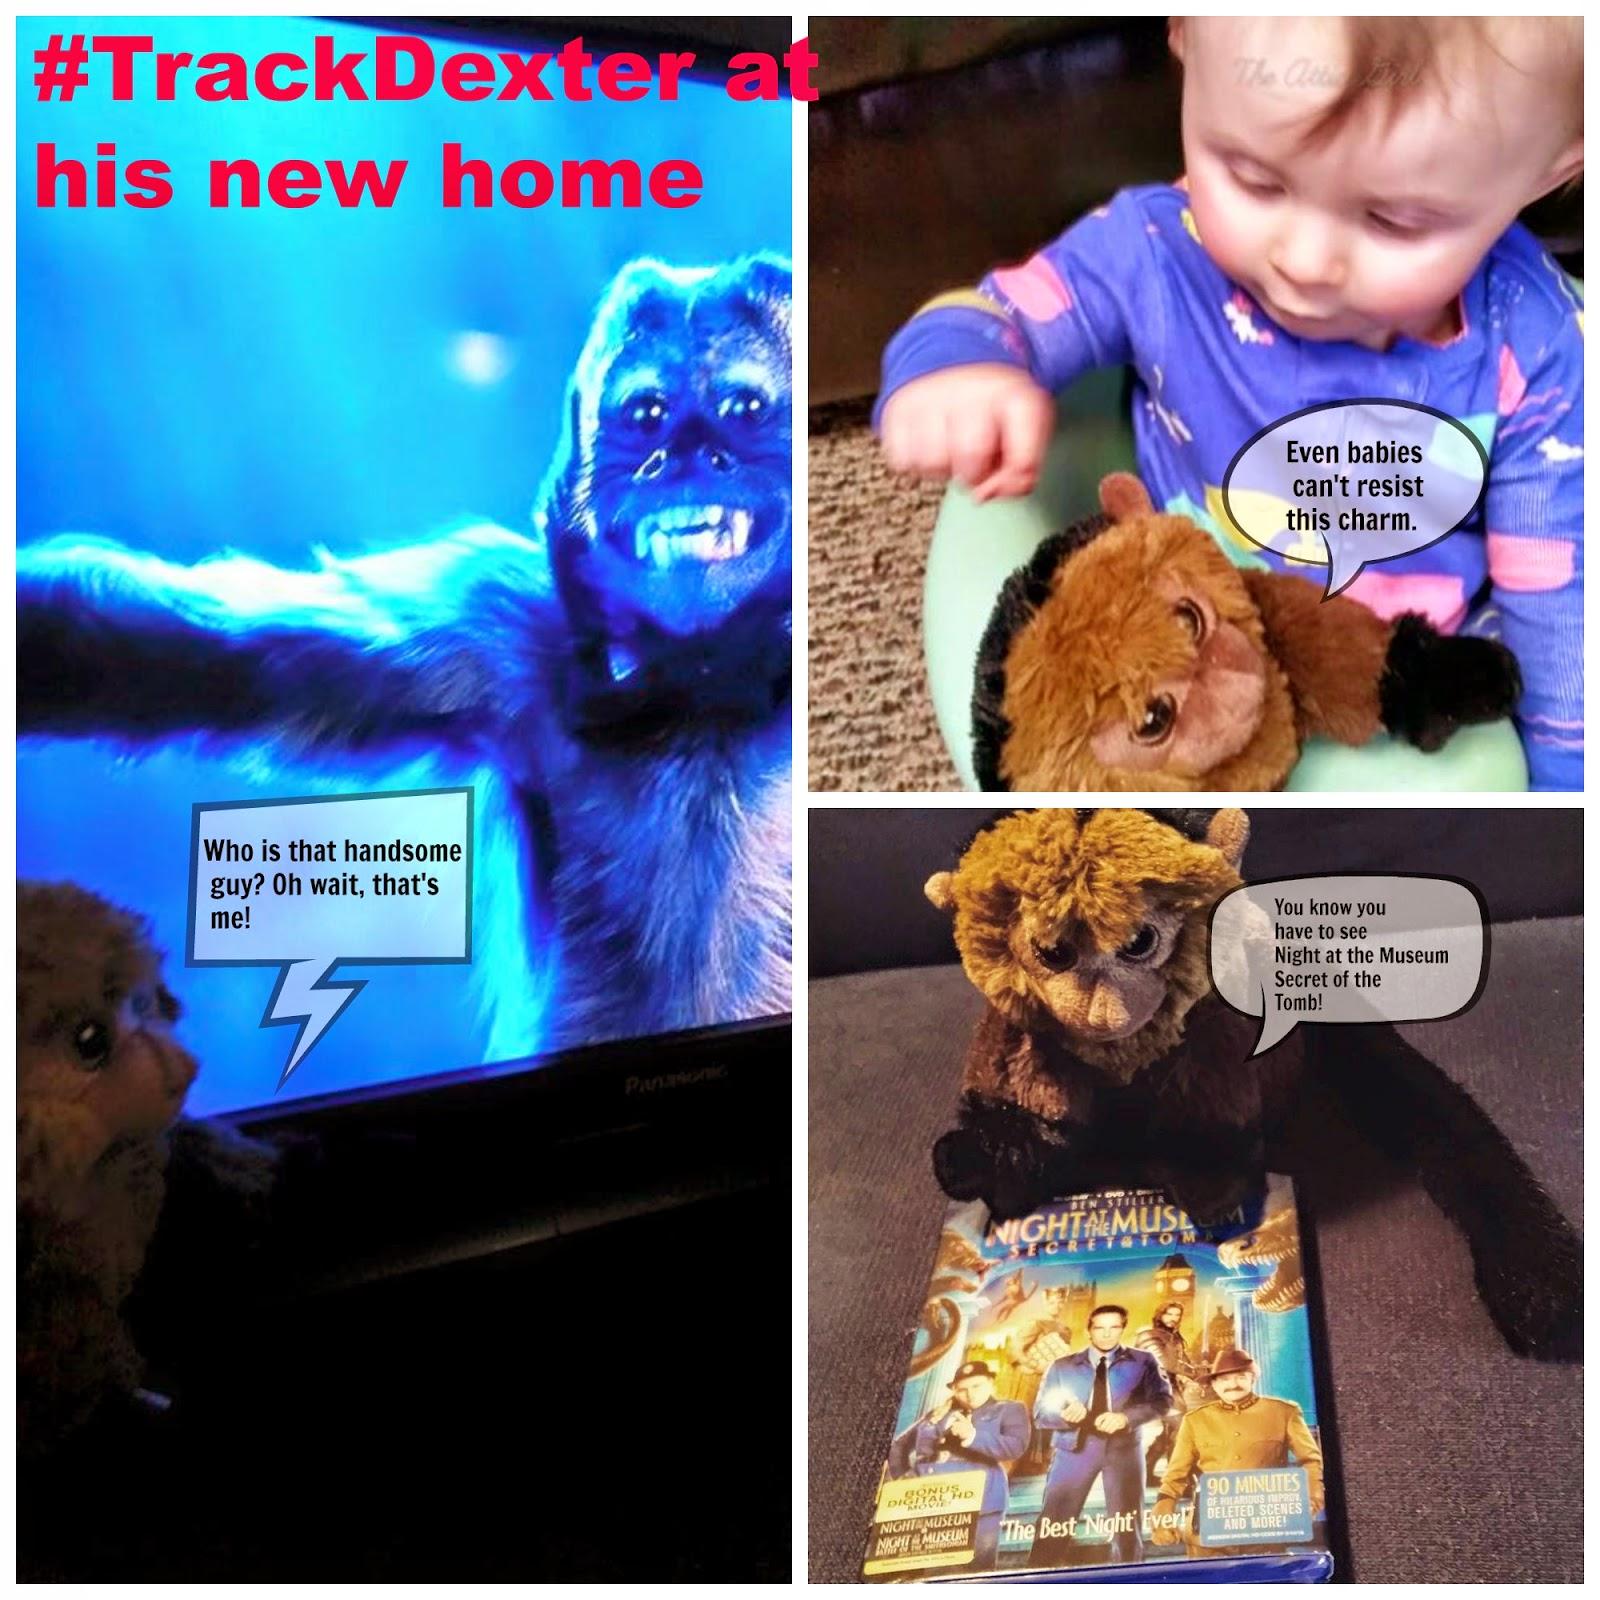 Track Dexter